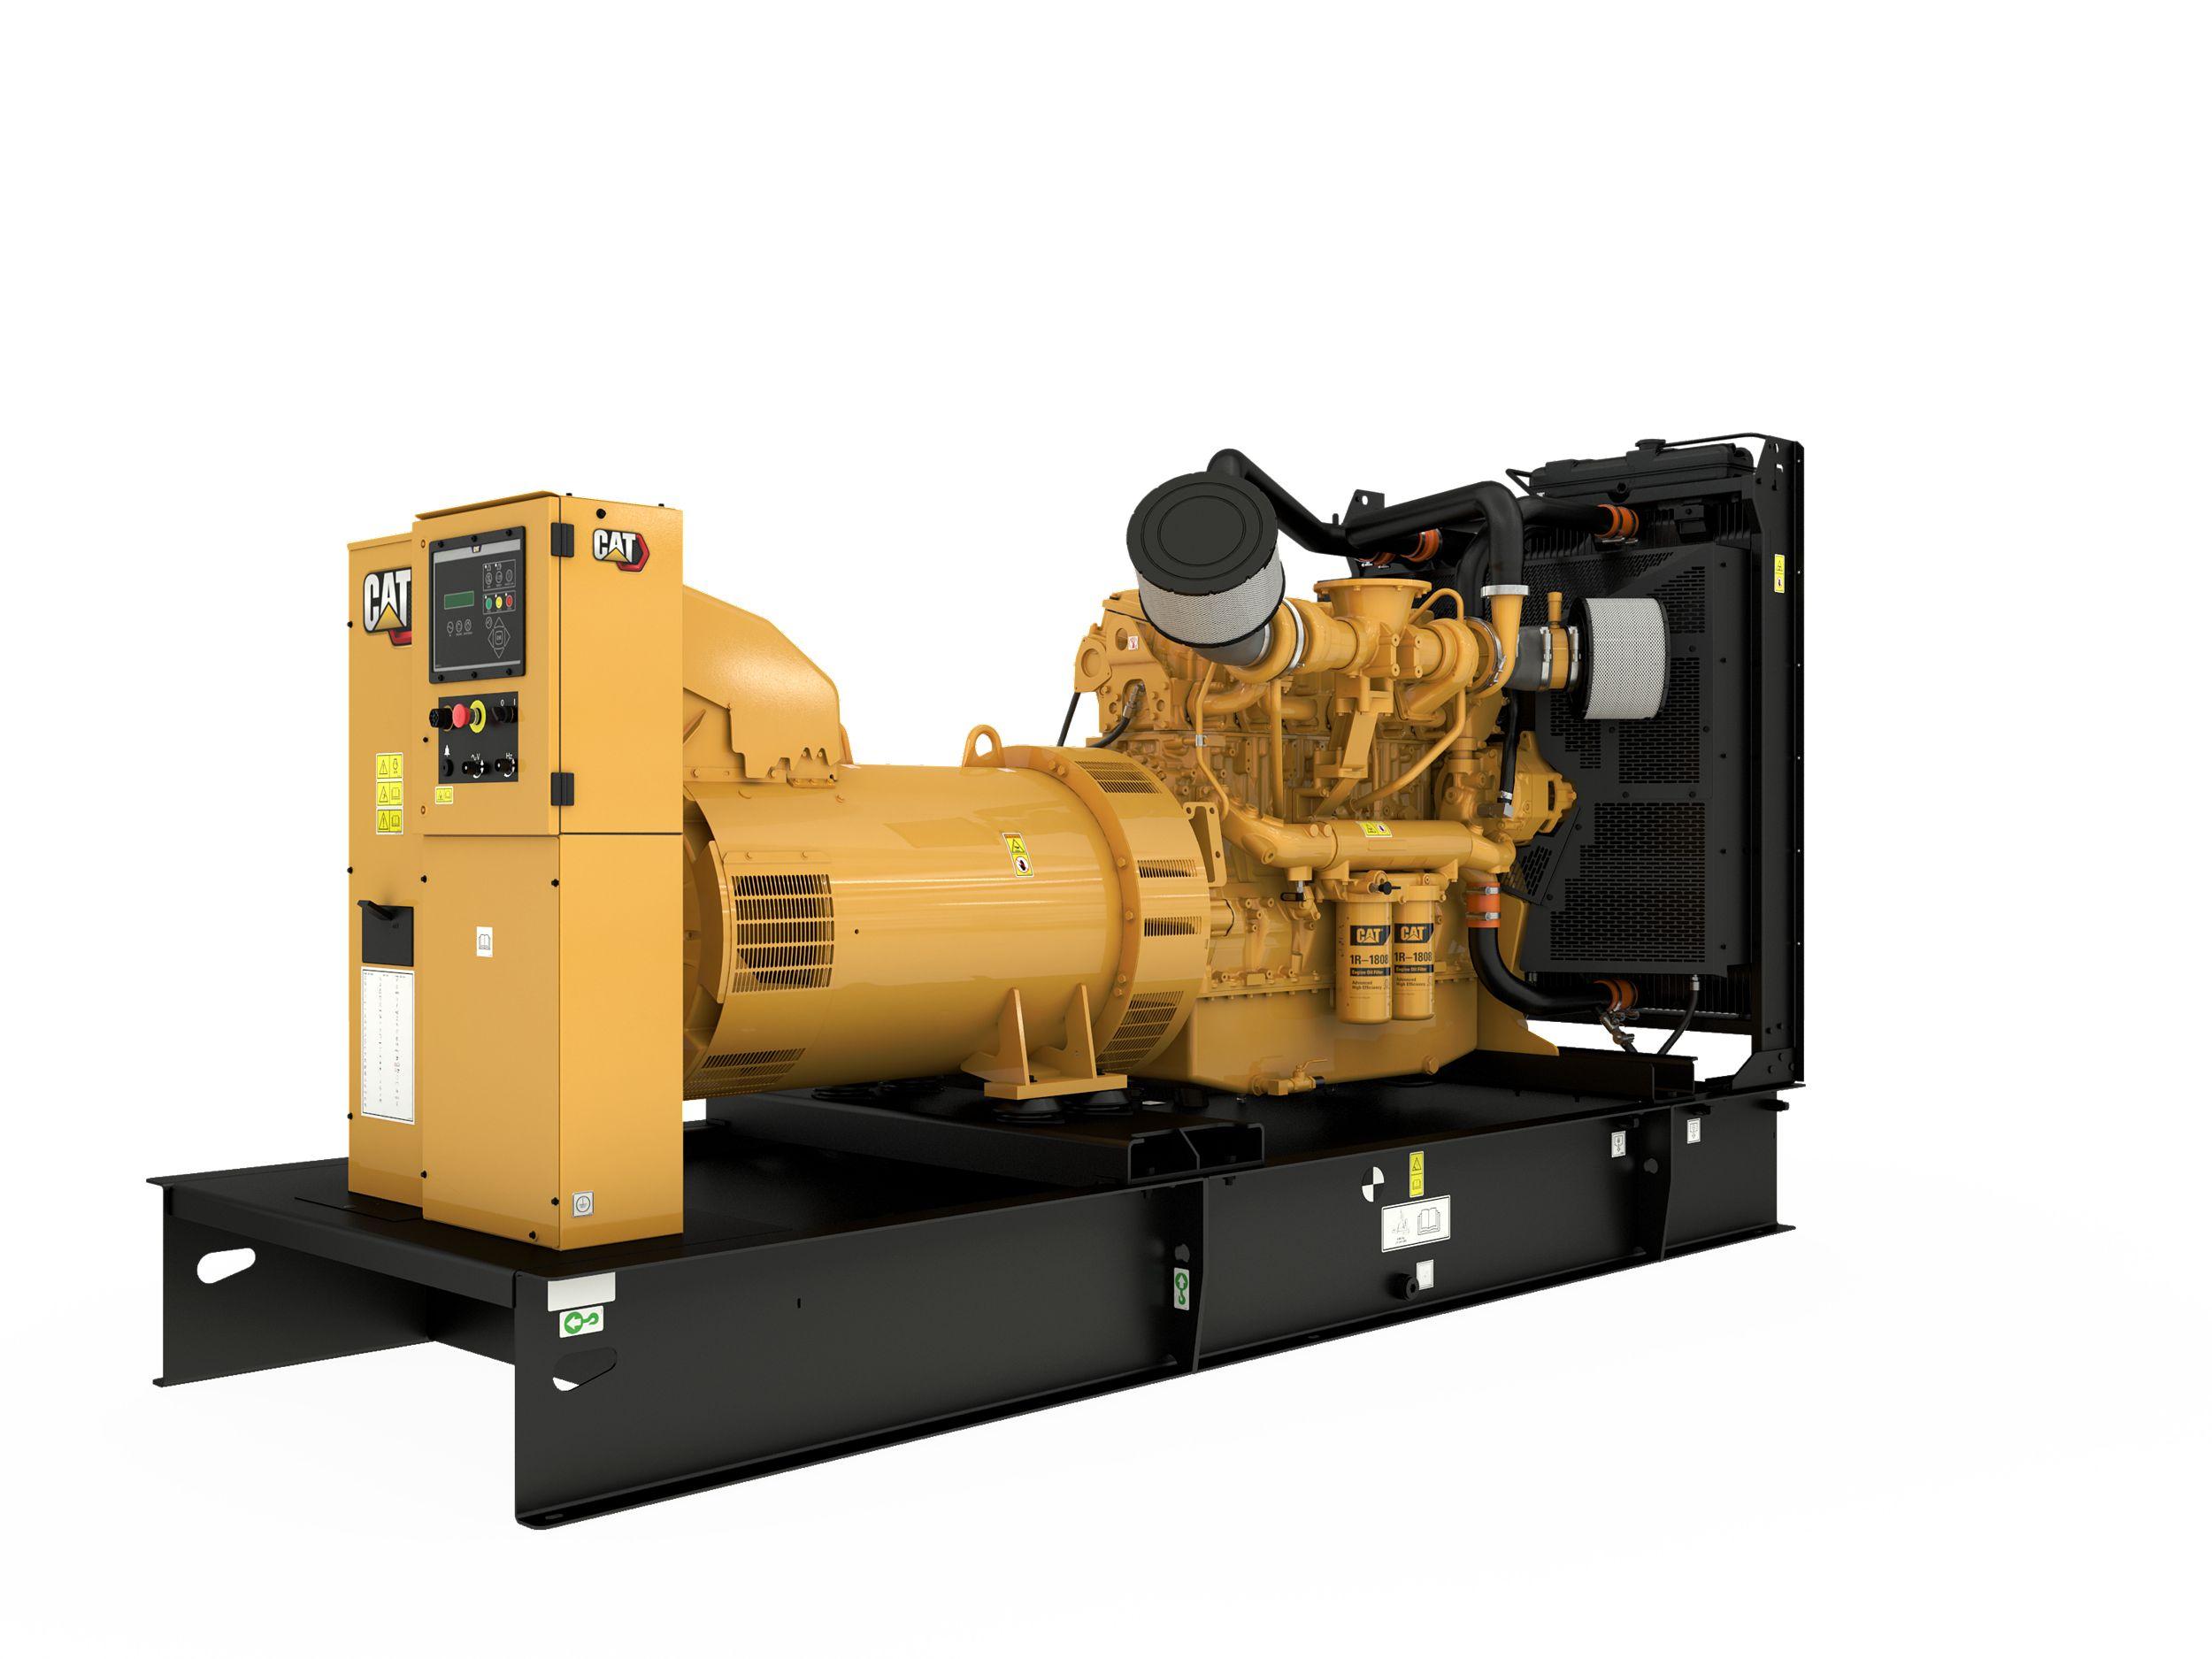 C18 generator set, rear right